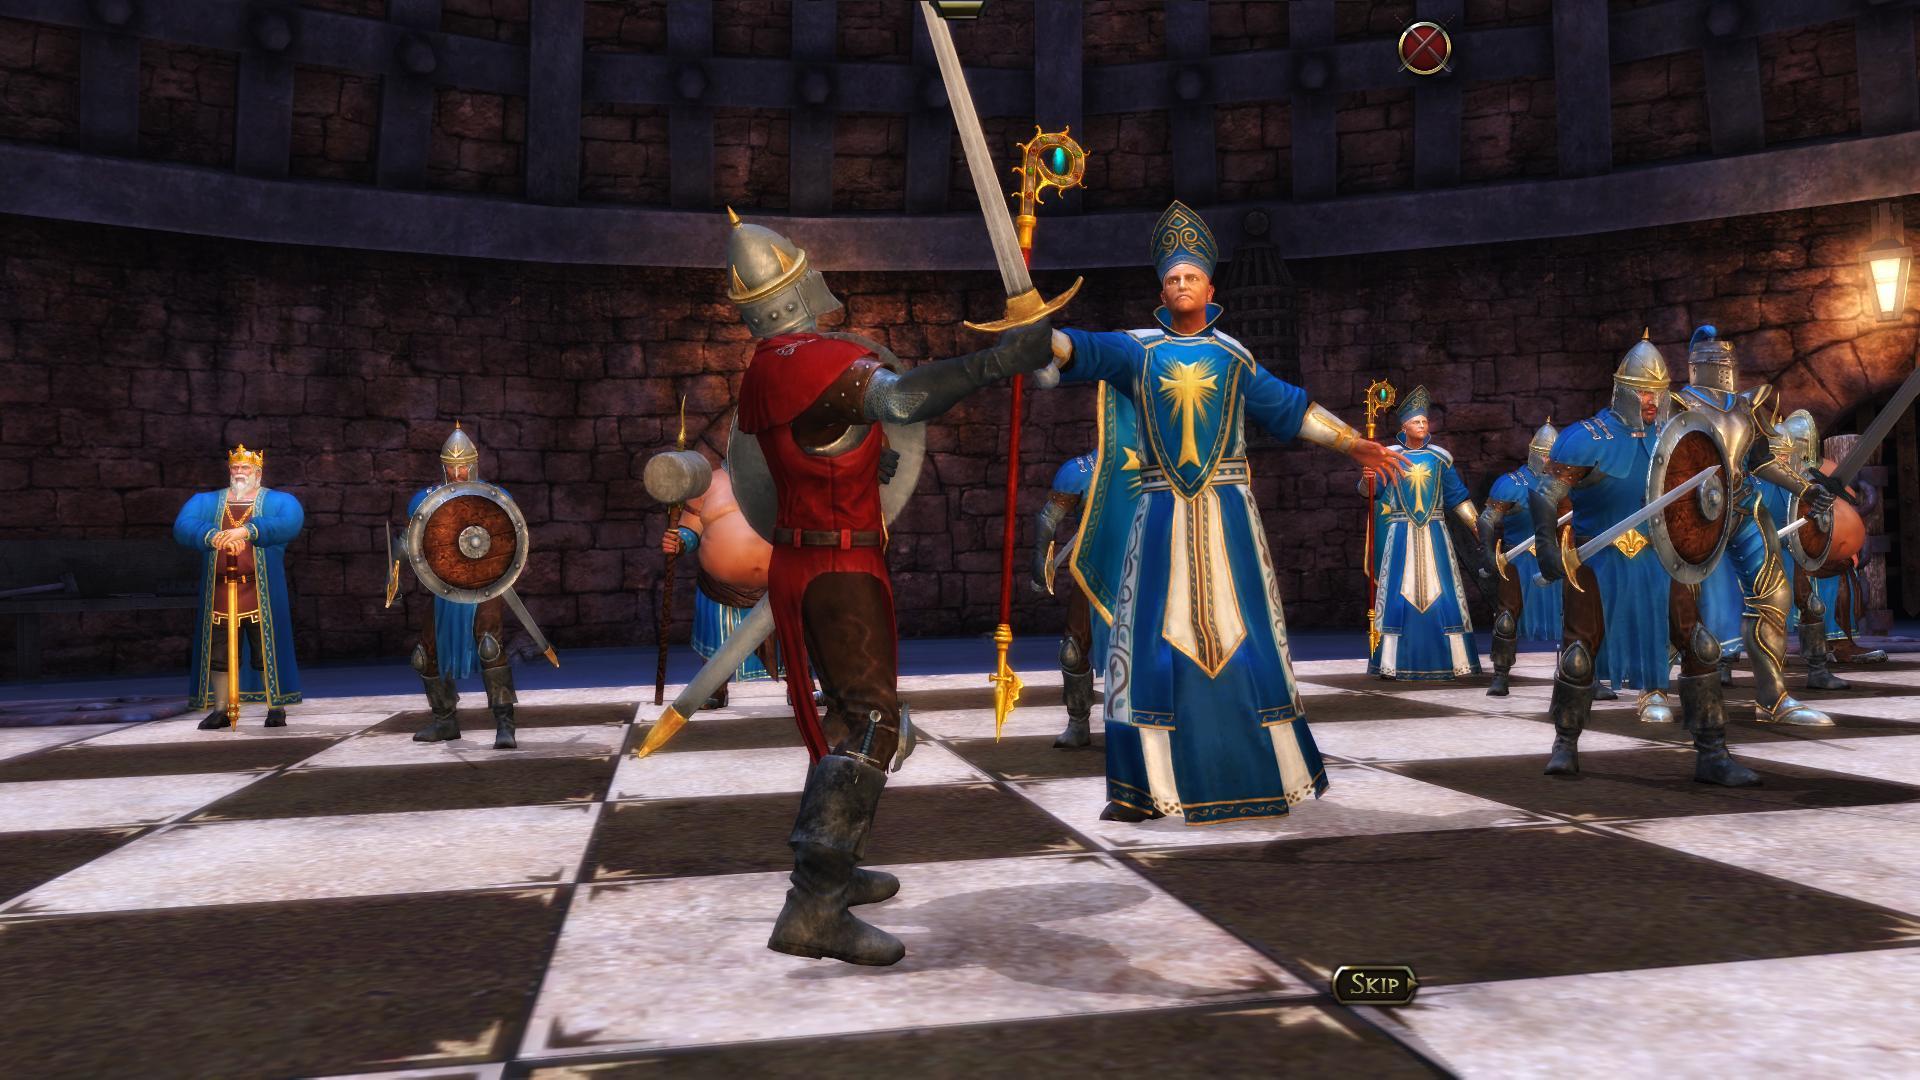 Battle Chess: Game of Kings screenshot